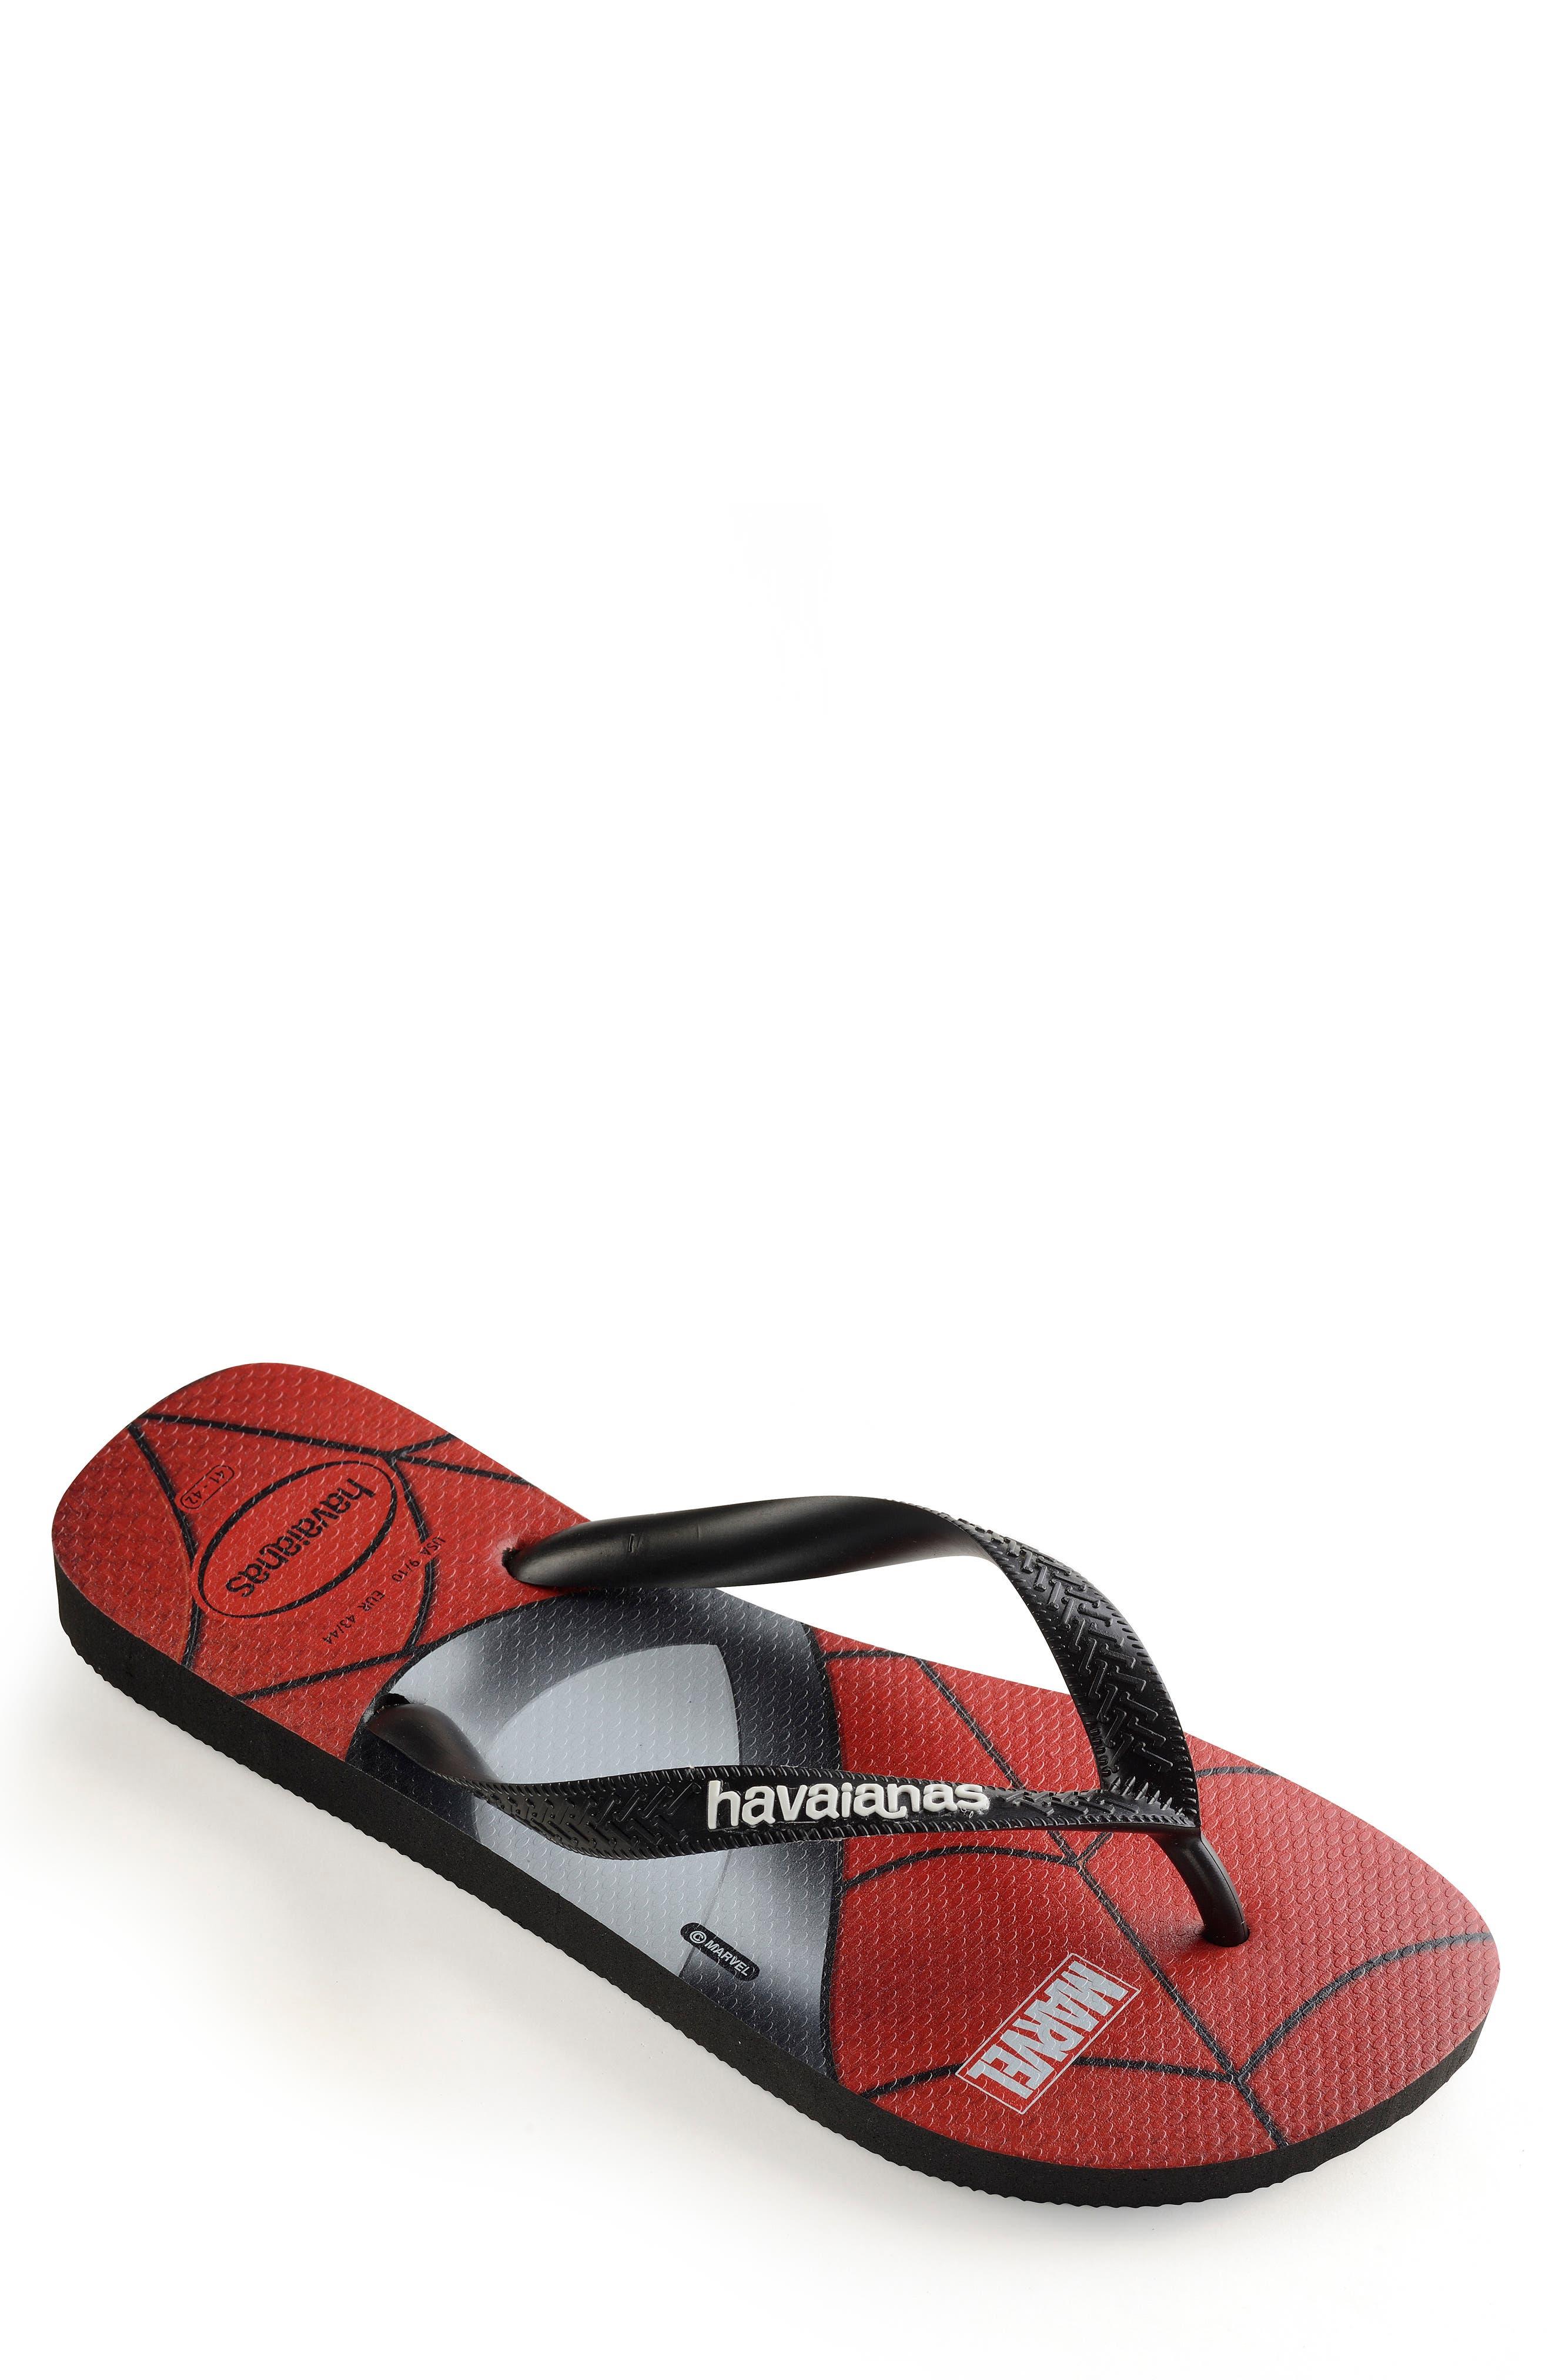 11224a911a5b2b Havaianas Flip-Flops for Men